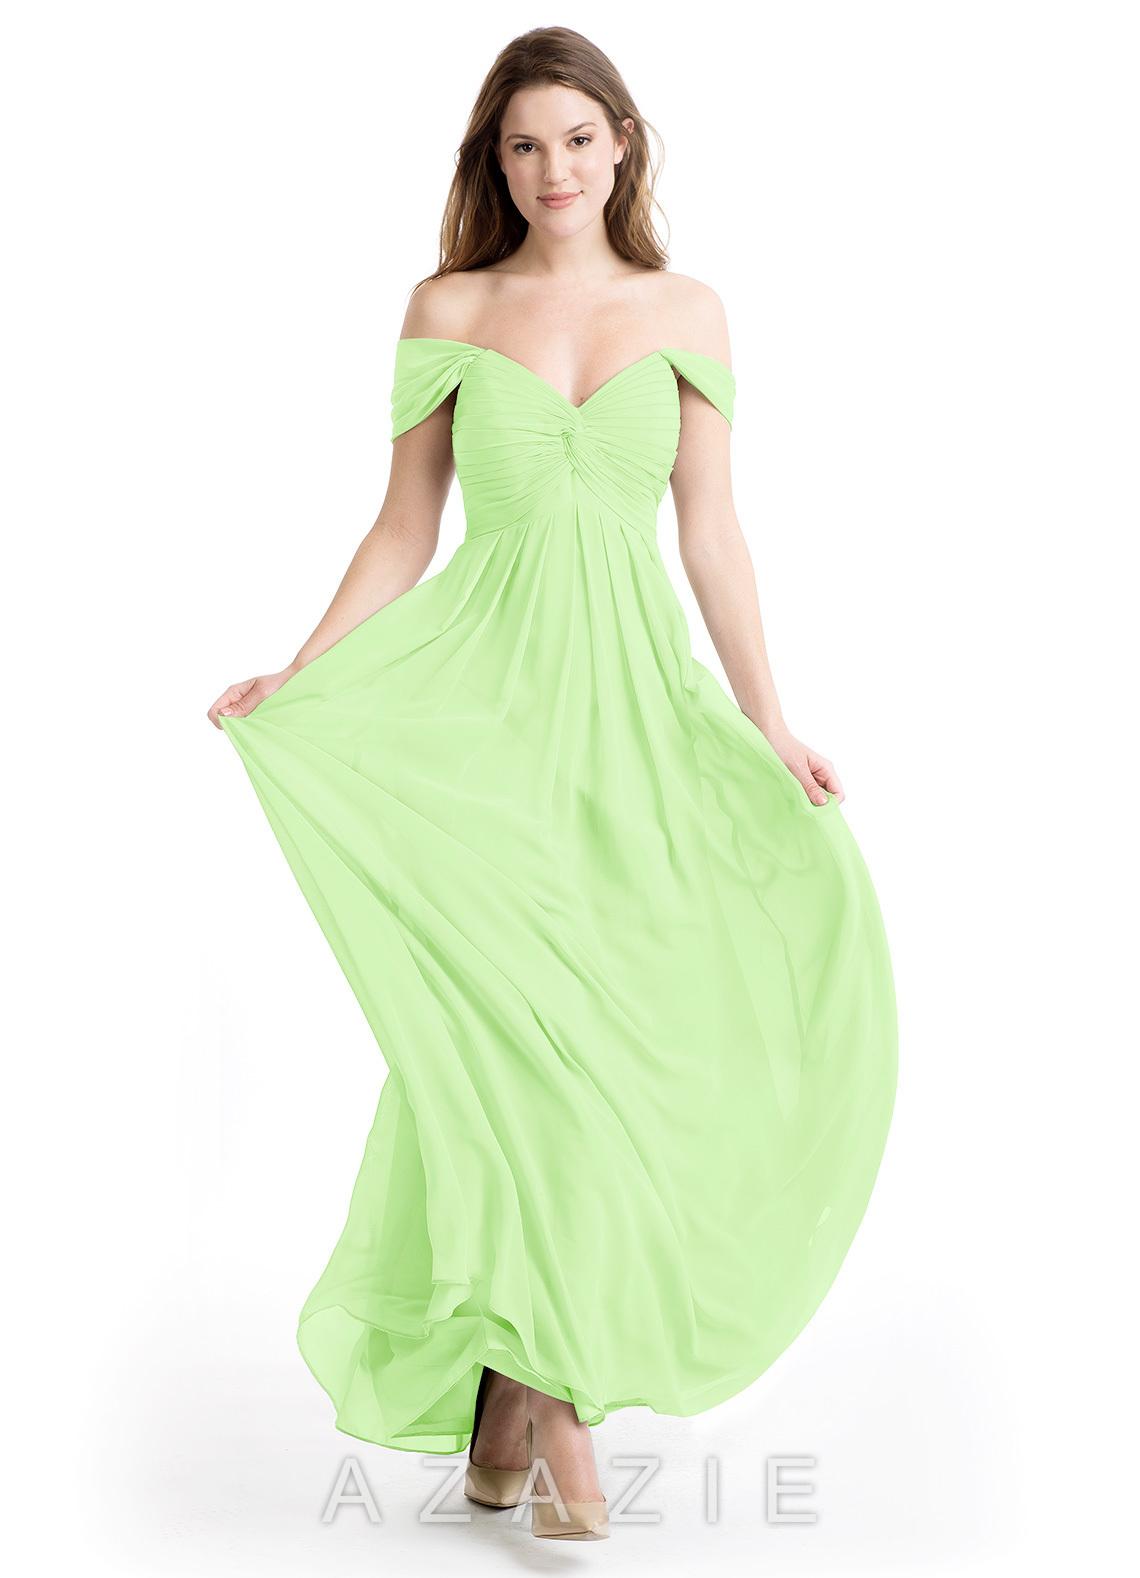 bb439f16f30 Kaitlynn Sample Dress. Loading zoom